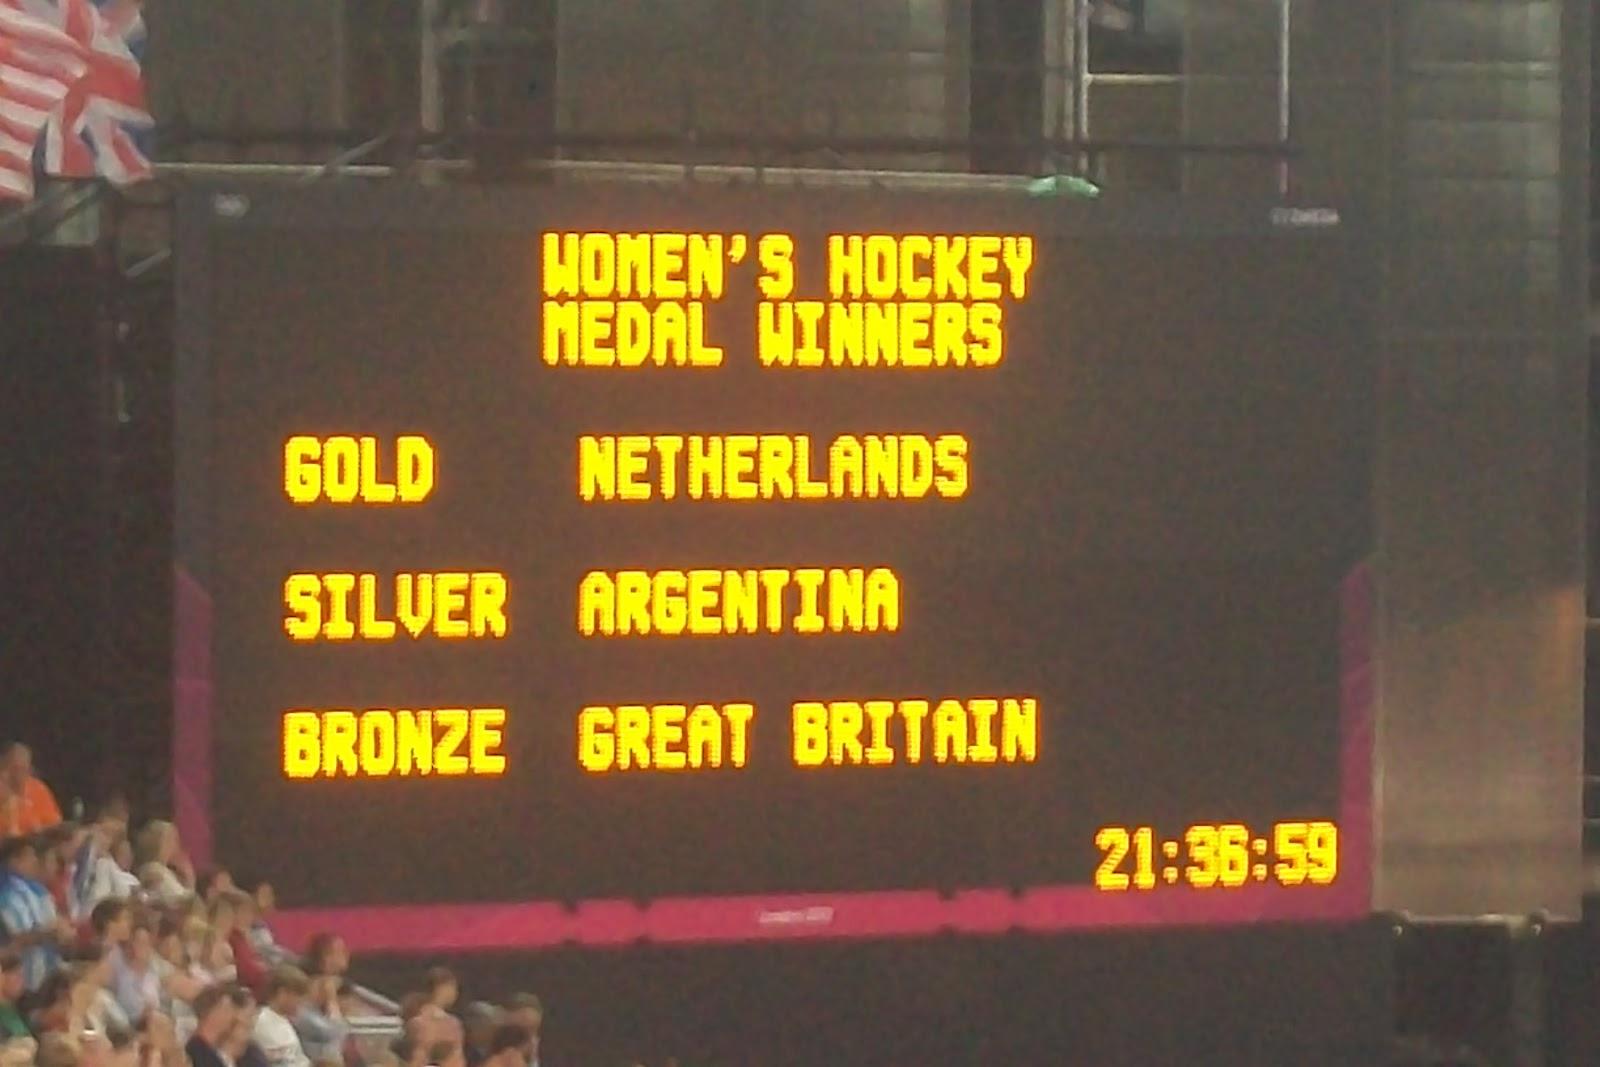 London 2012 Womens Hockey Final